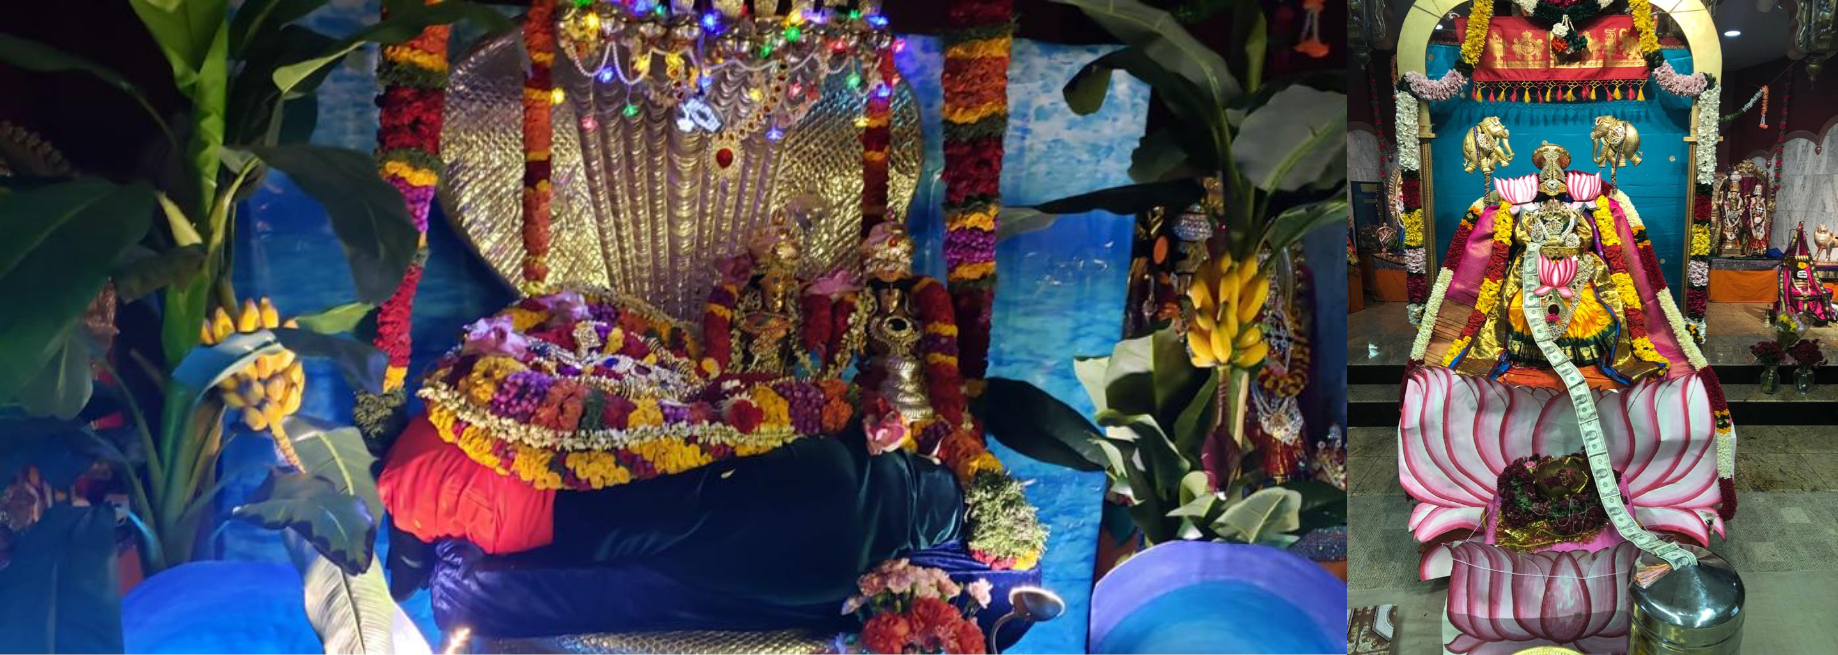 iowa hindu temple